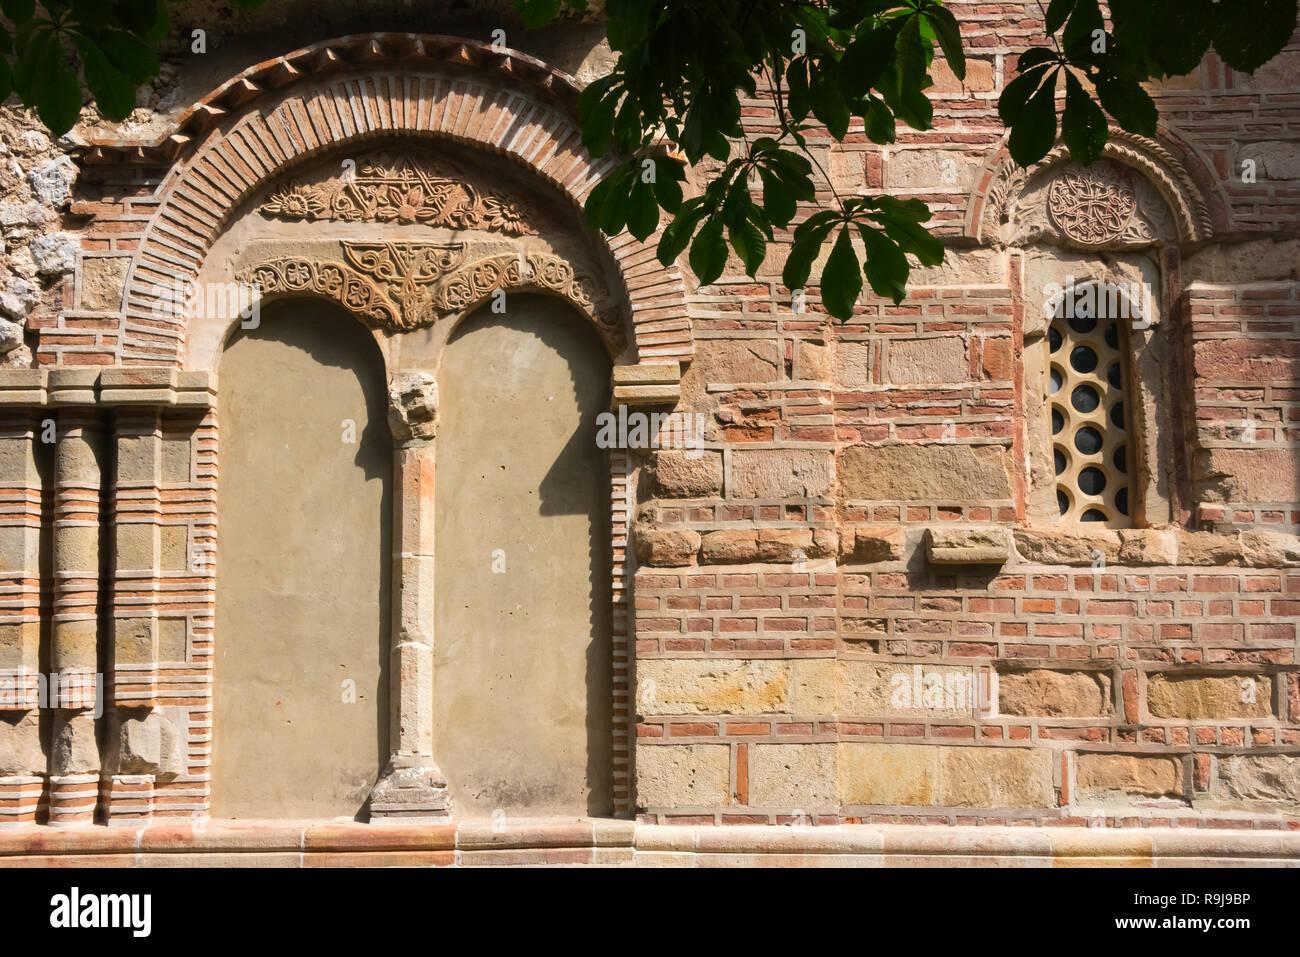 Monastery Ravanica, a Serbian Orthodox monastery, Cuprija, Serbia - Stock Image